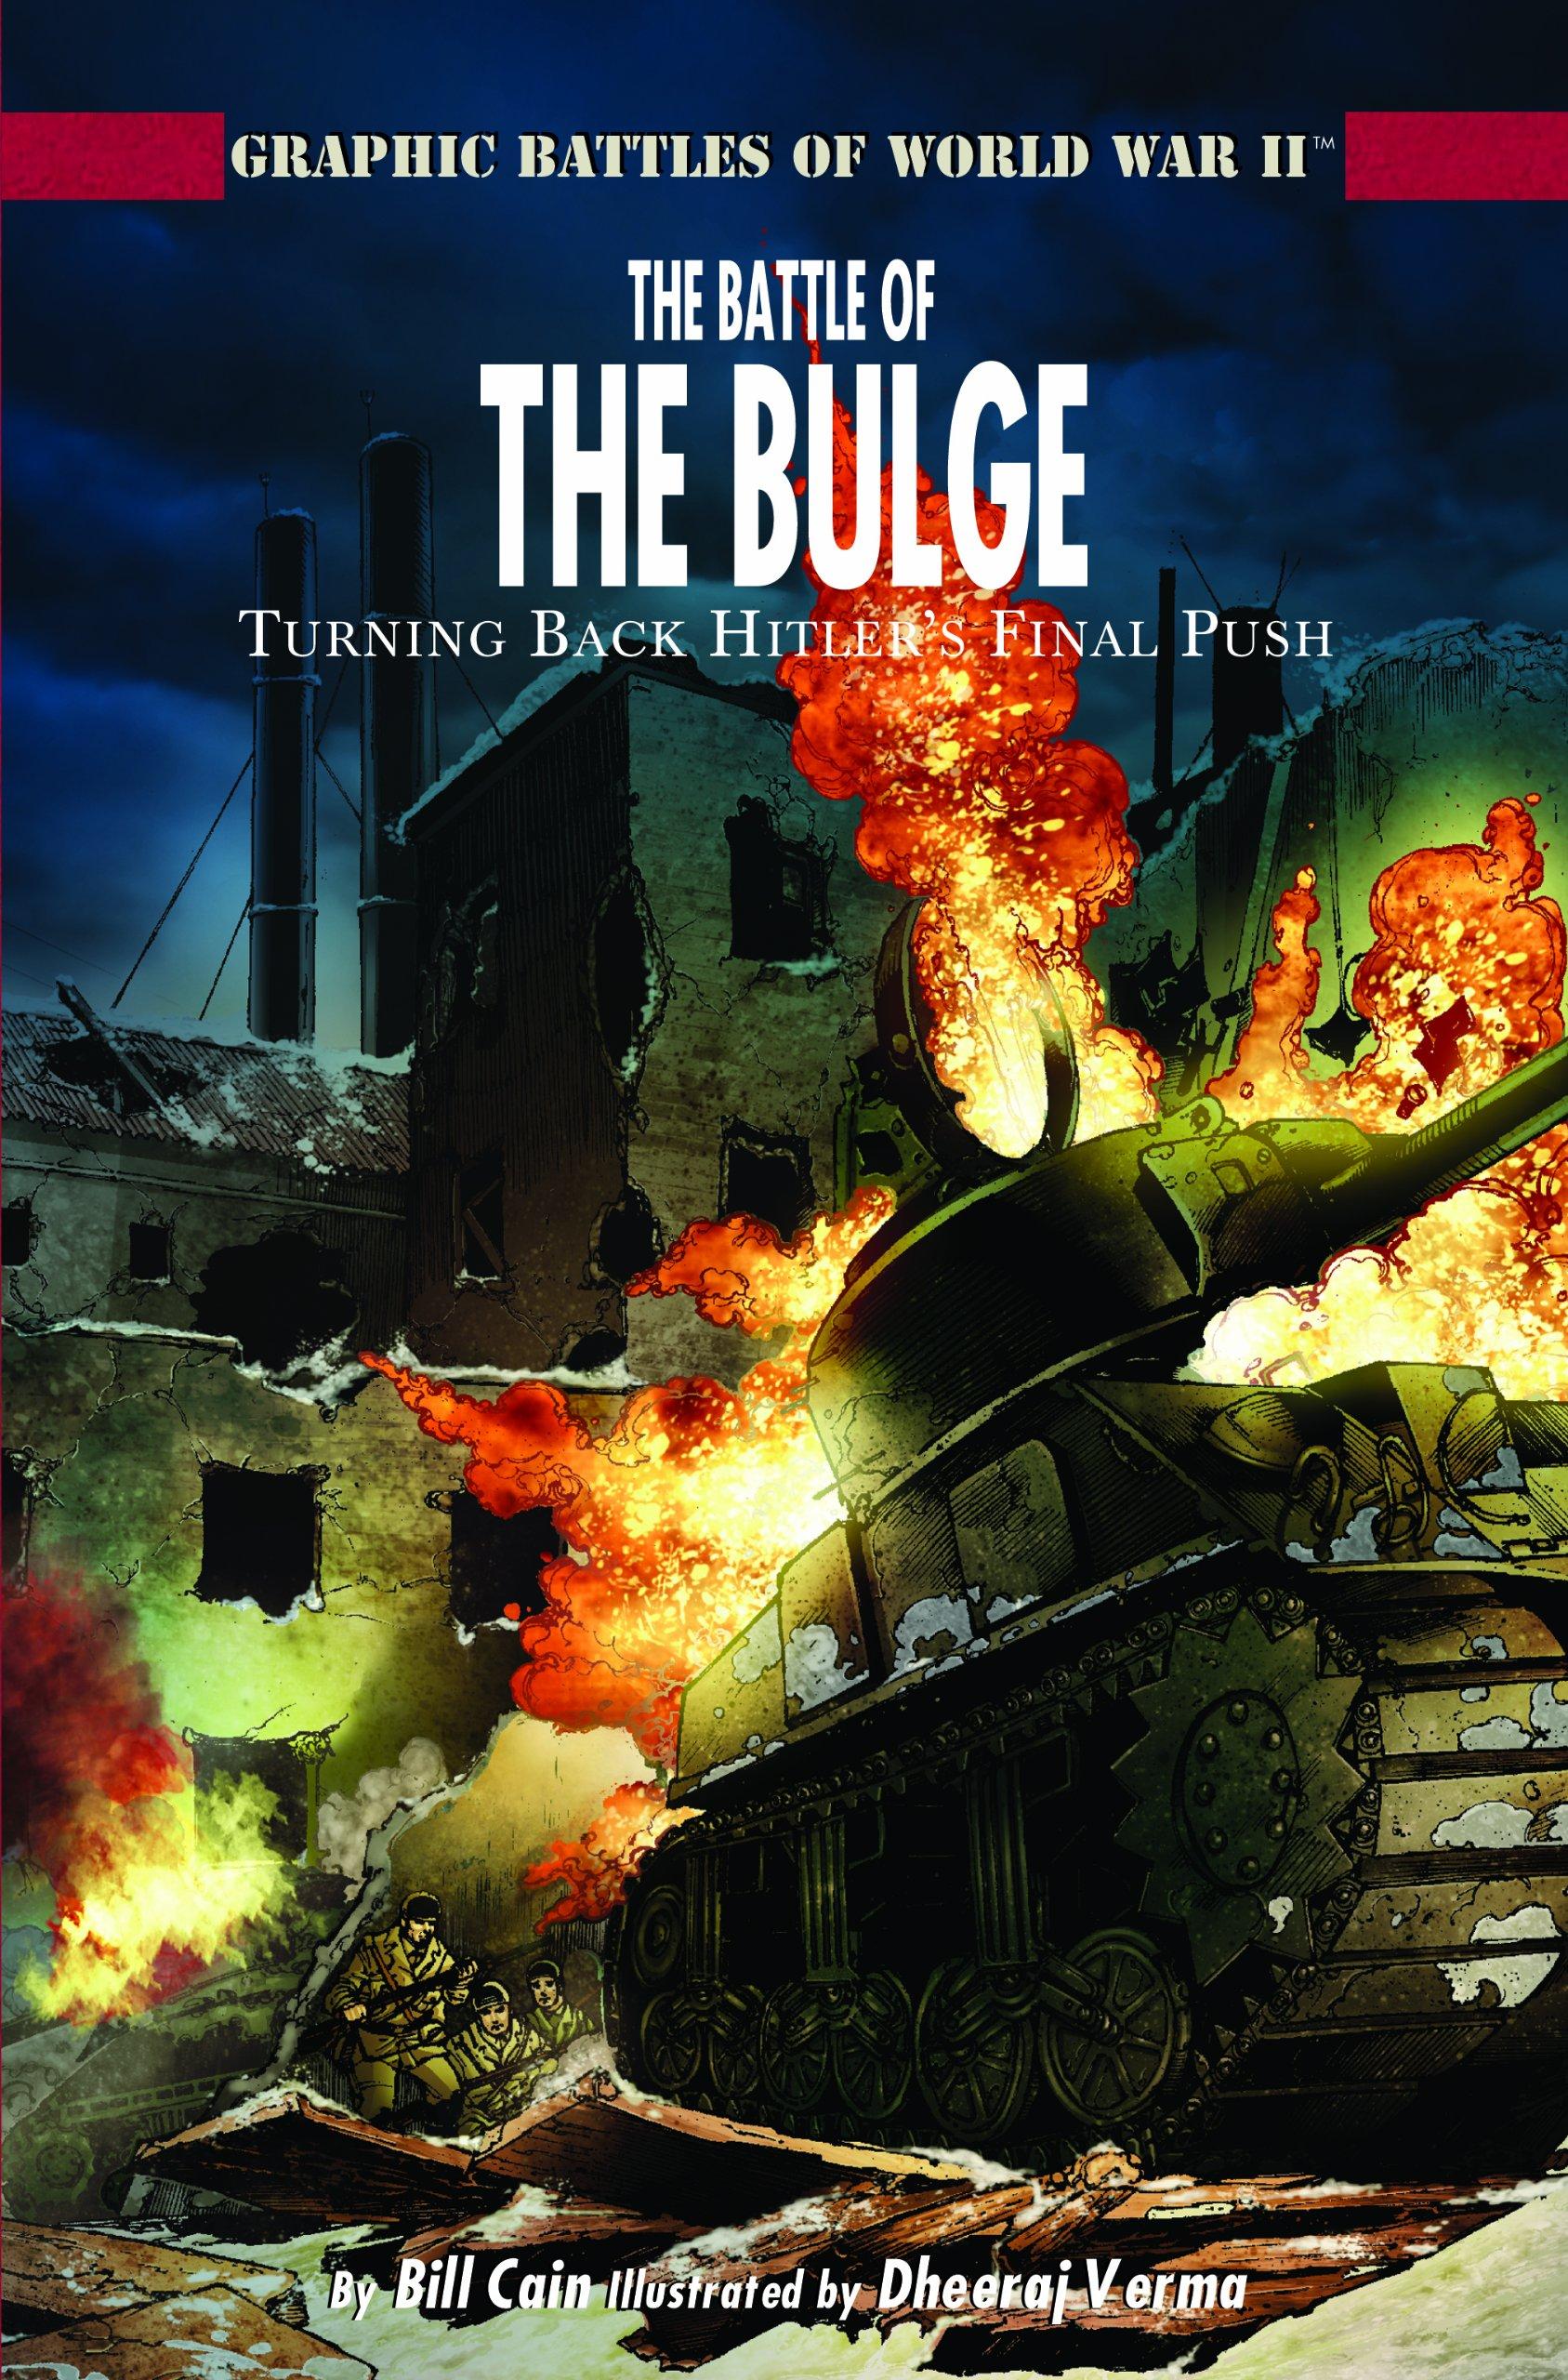 The Battle of the Bulge: Turning Back Hitler's Final Push (Graphic Battles of World War II)